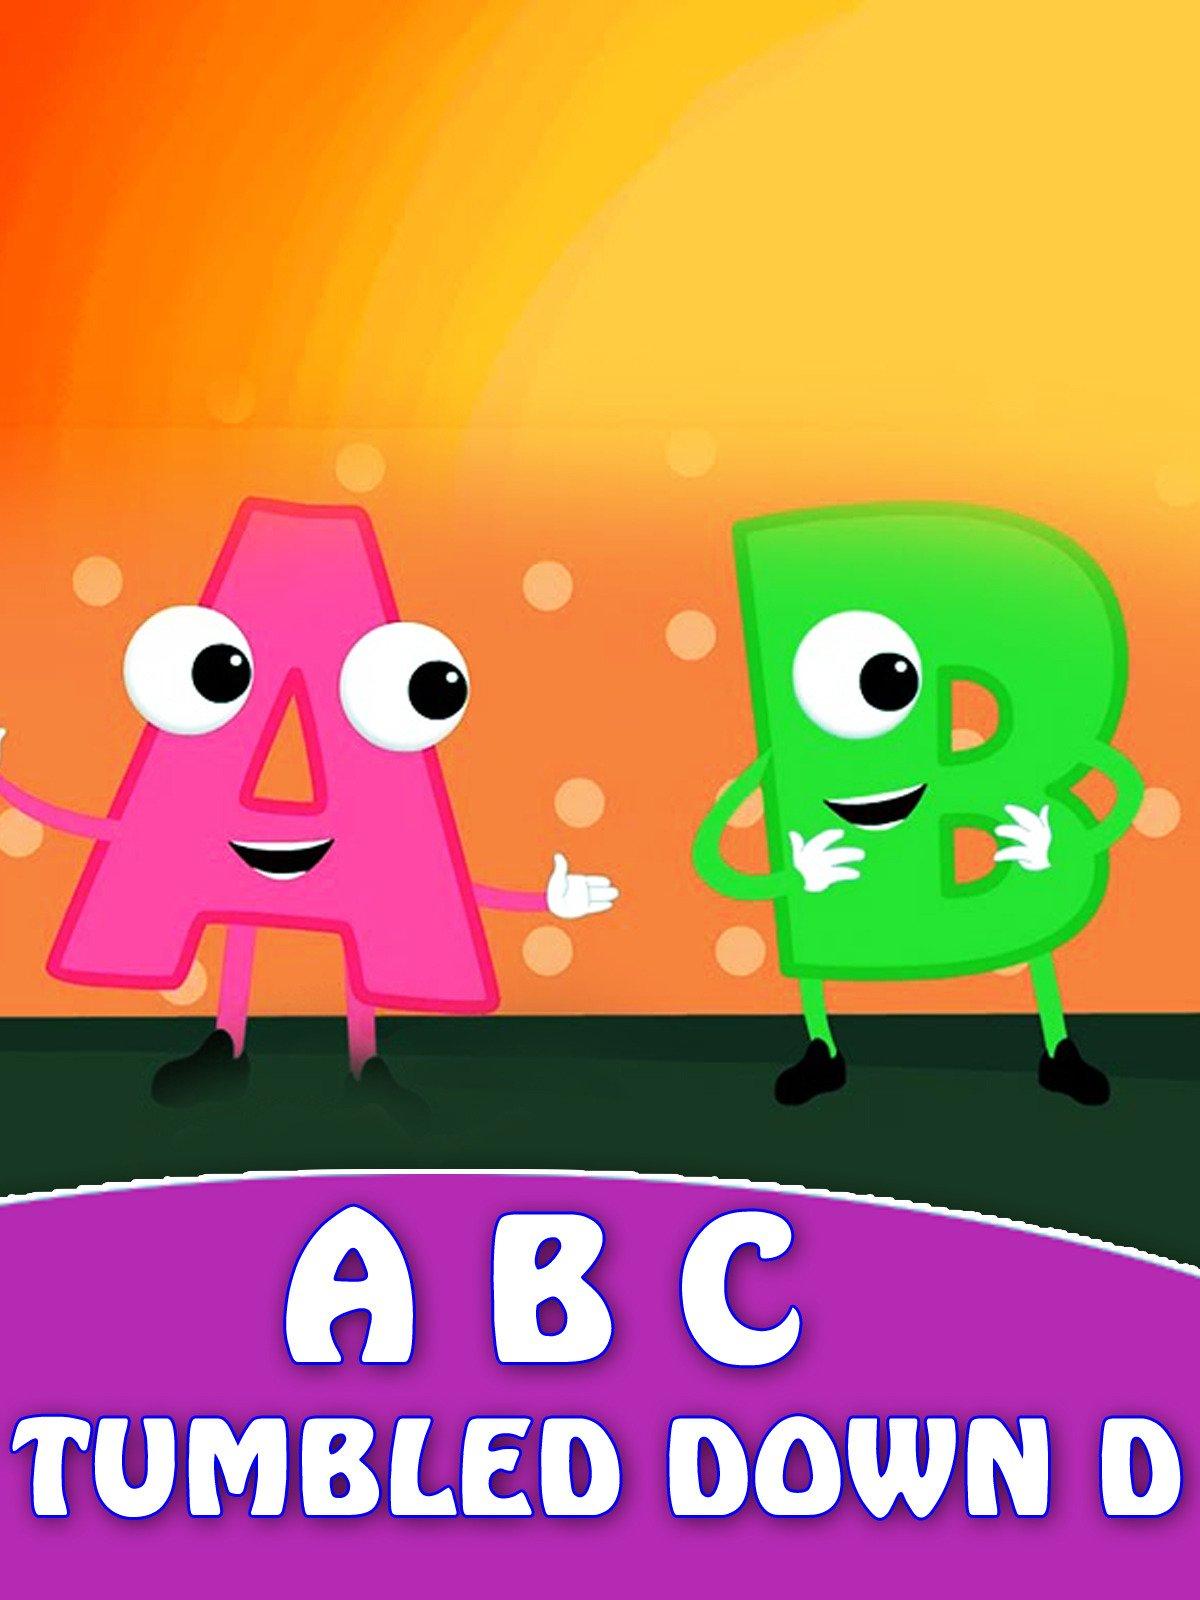 Abc Tumbled Down D on Amazon Prime Video UK